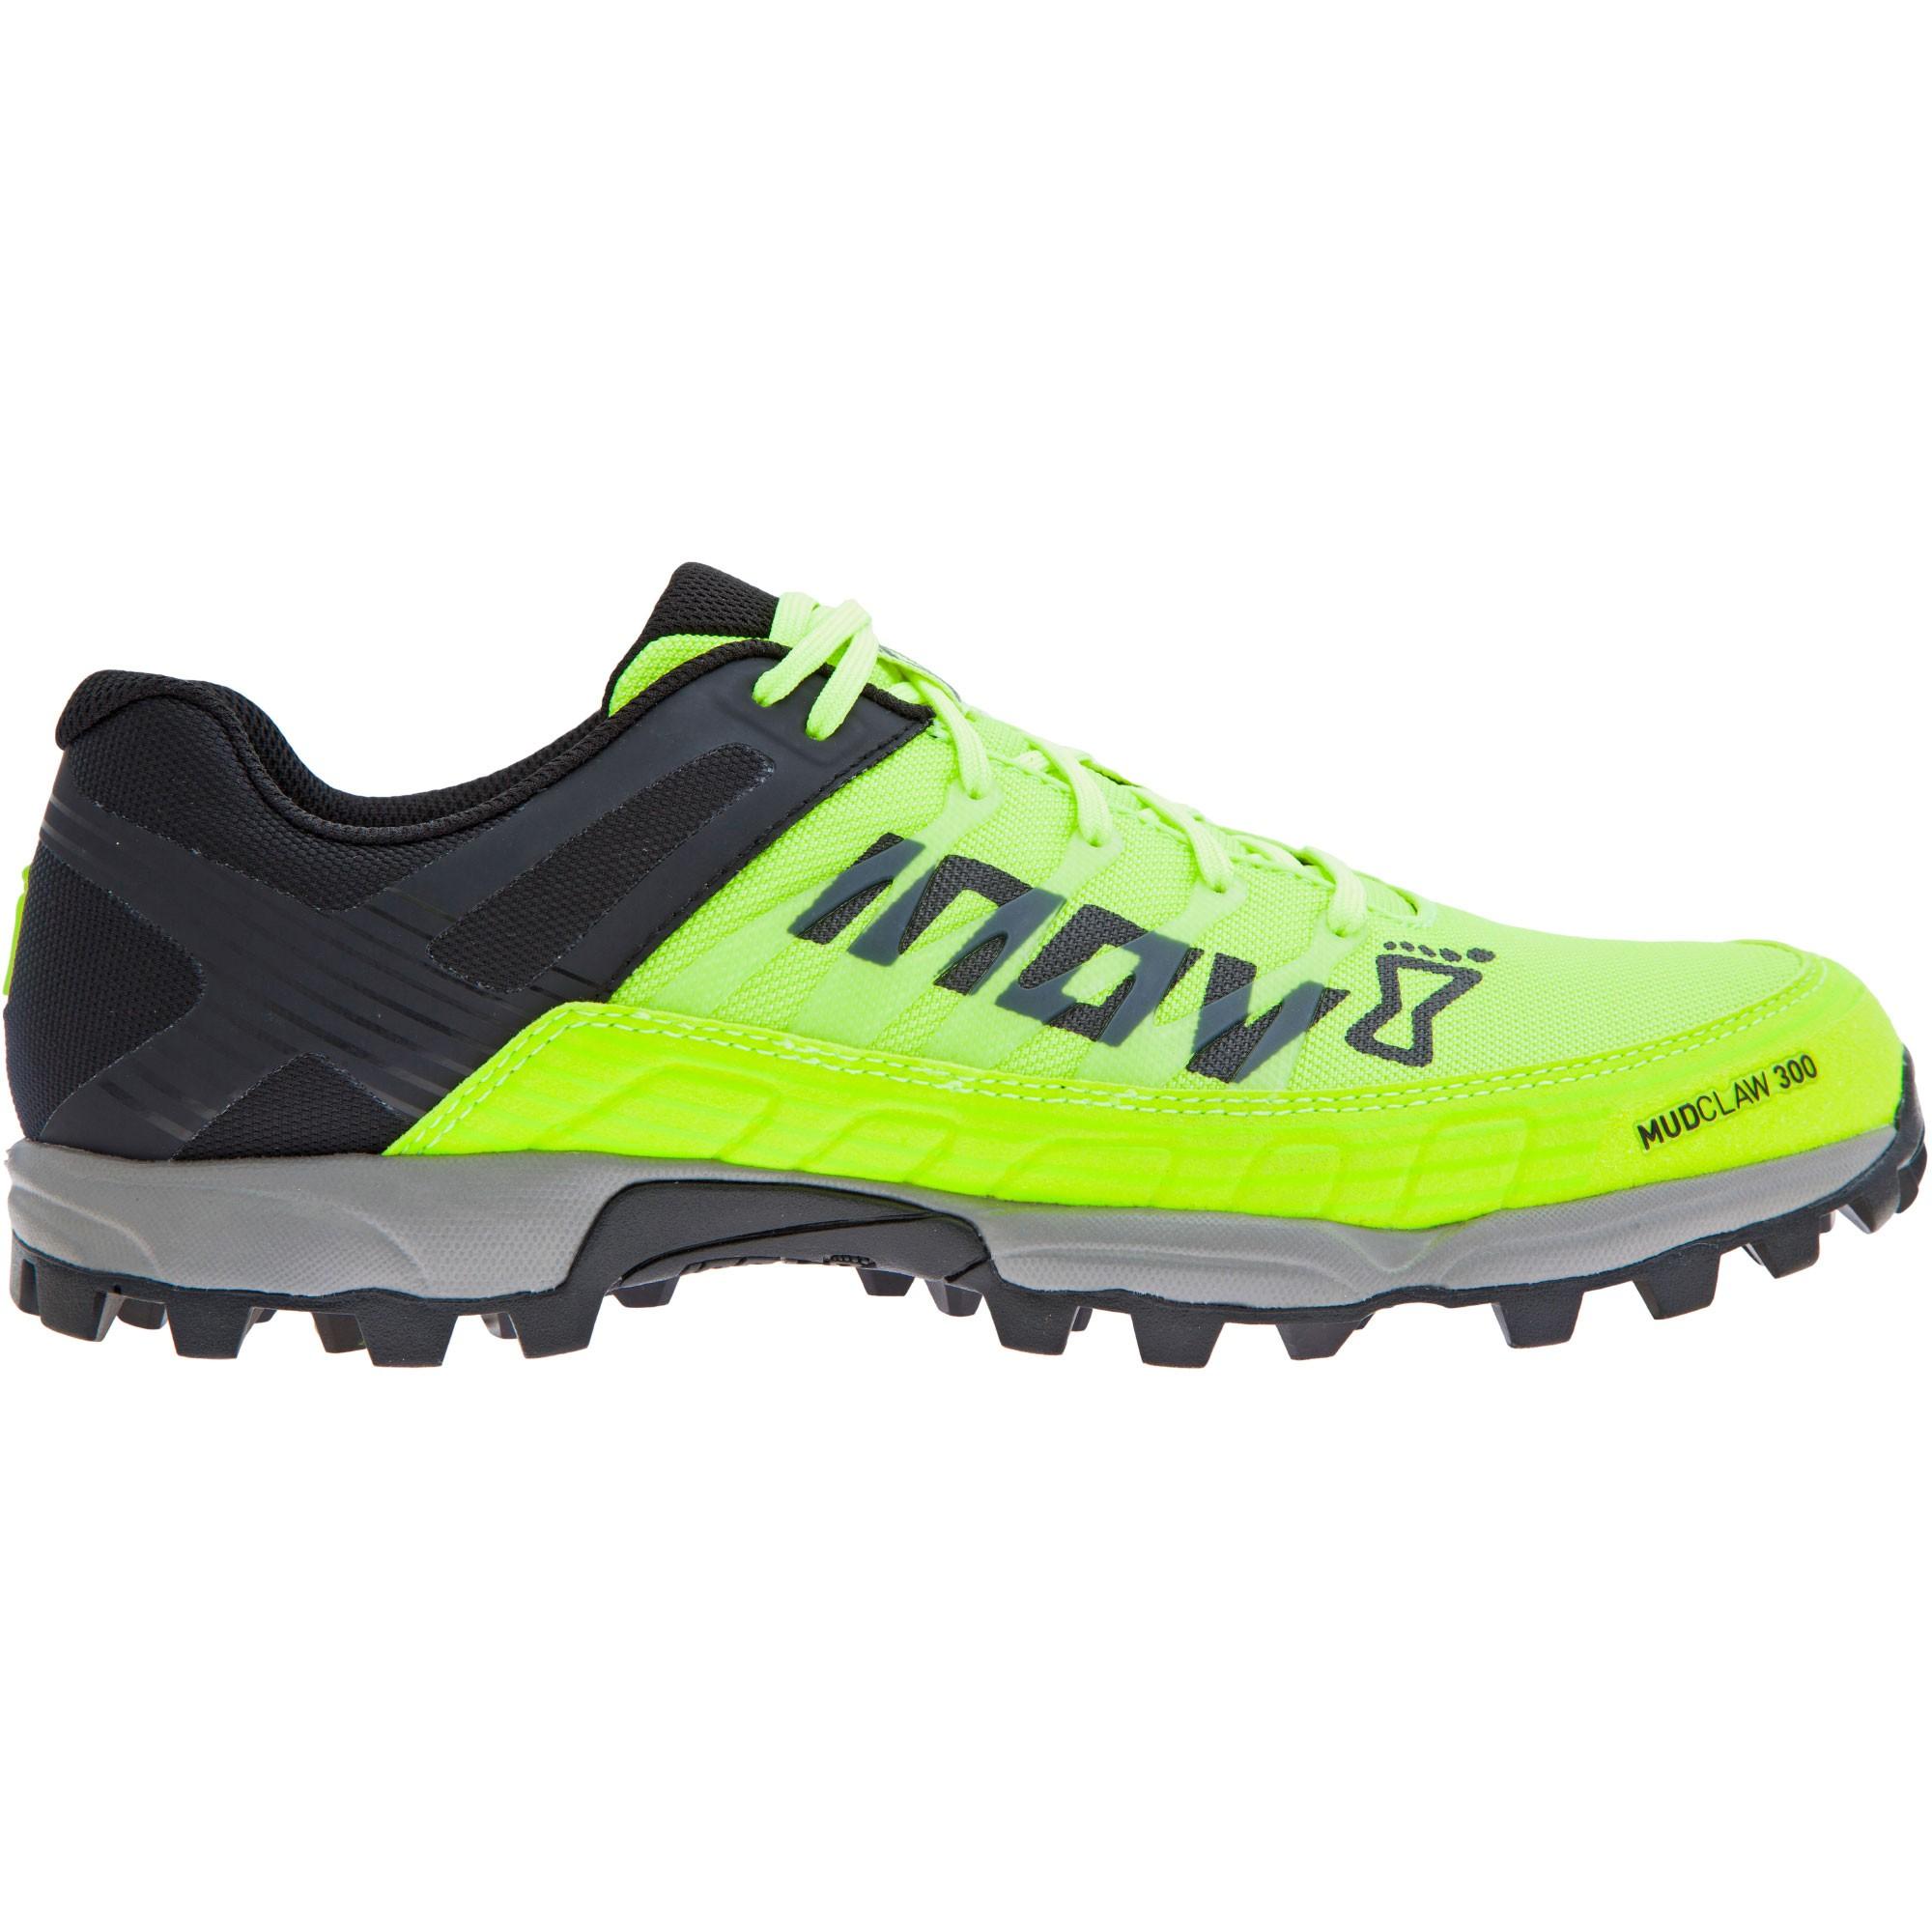 INOV8 - Mudclaw 300 Fell Running Shoes - Yellow/Black/Grey